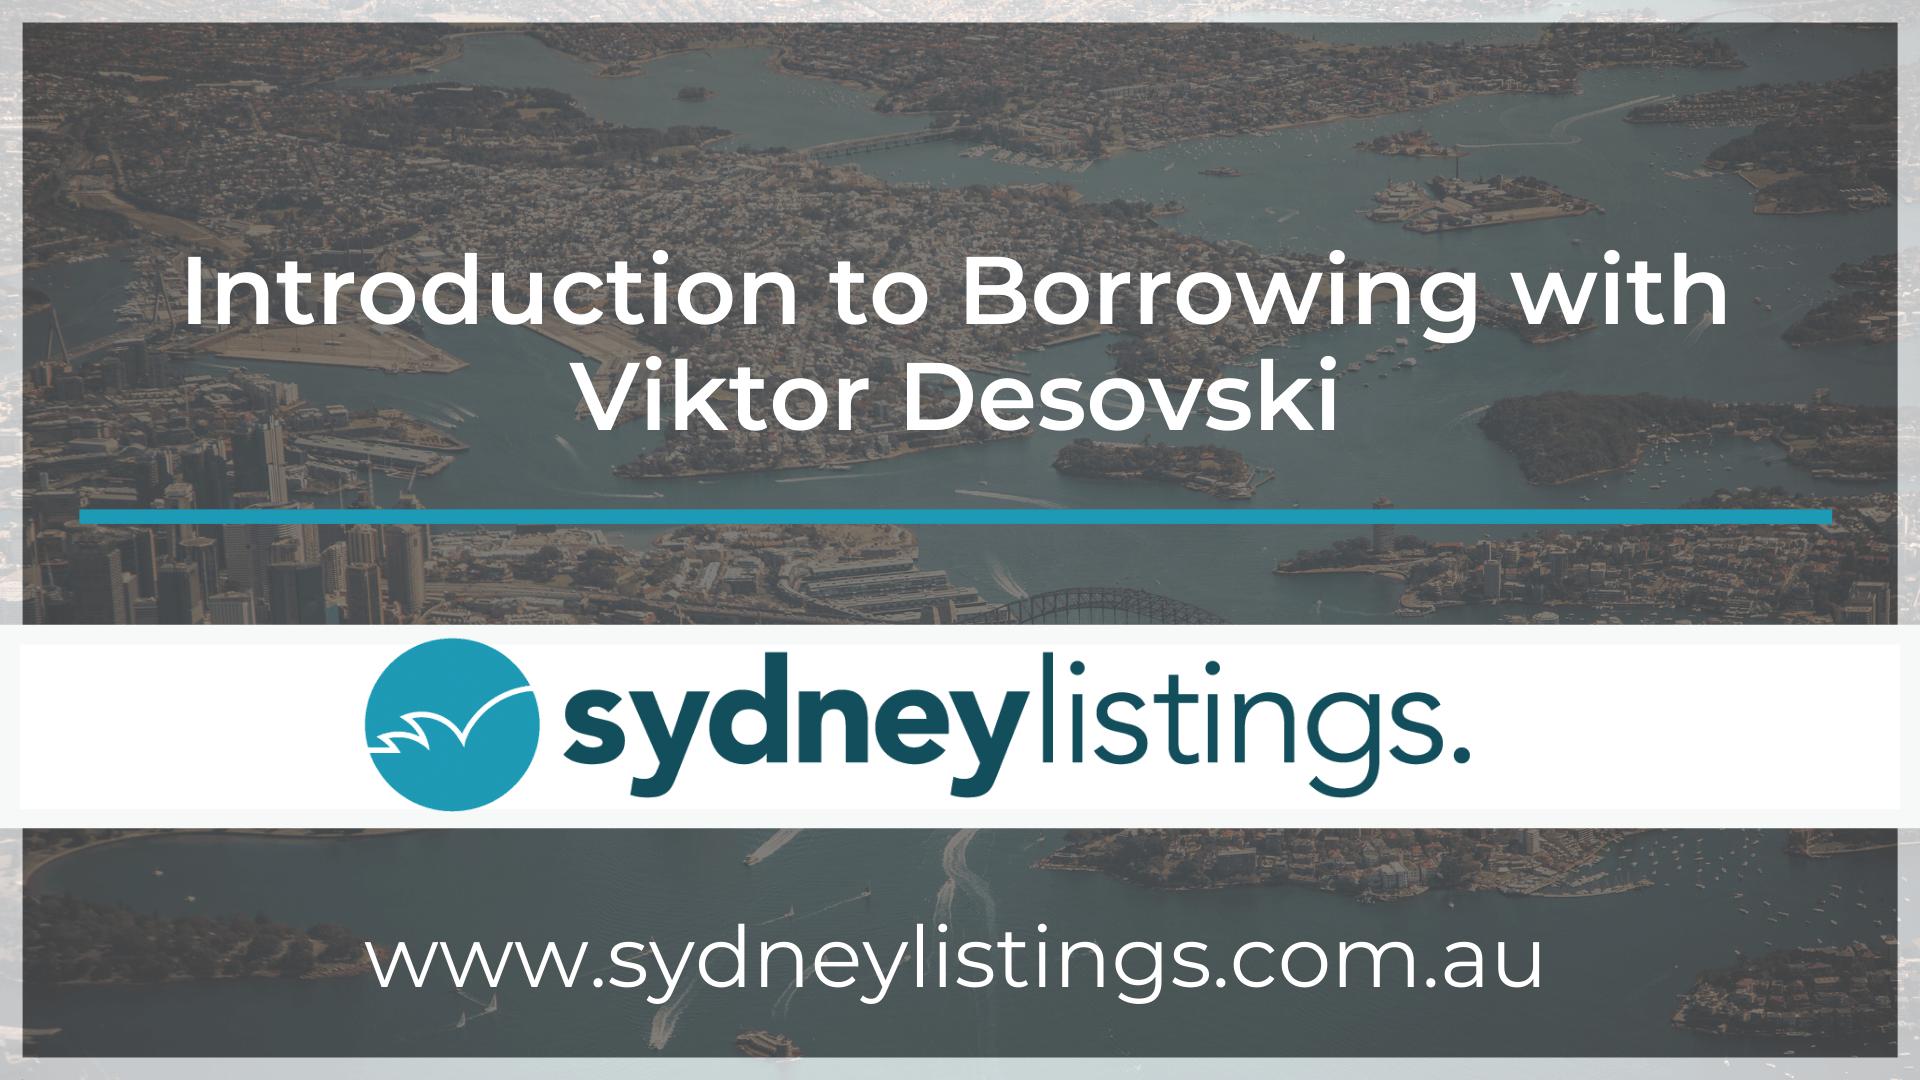 Introduction to Borrowing with Viktor Desovski